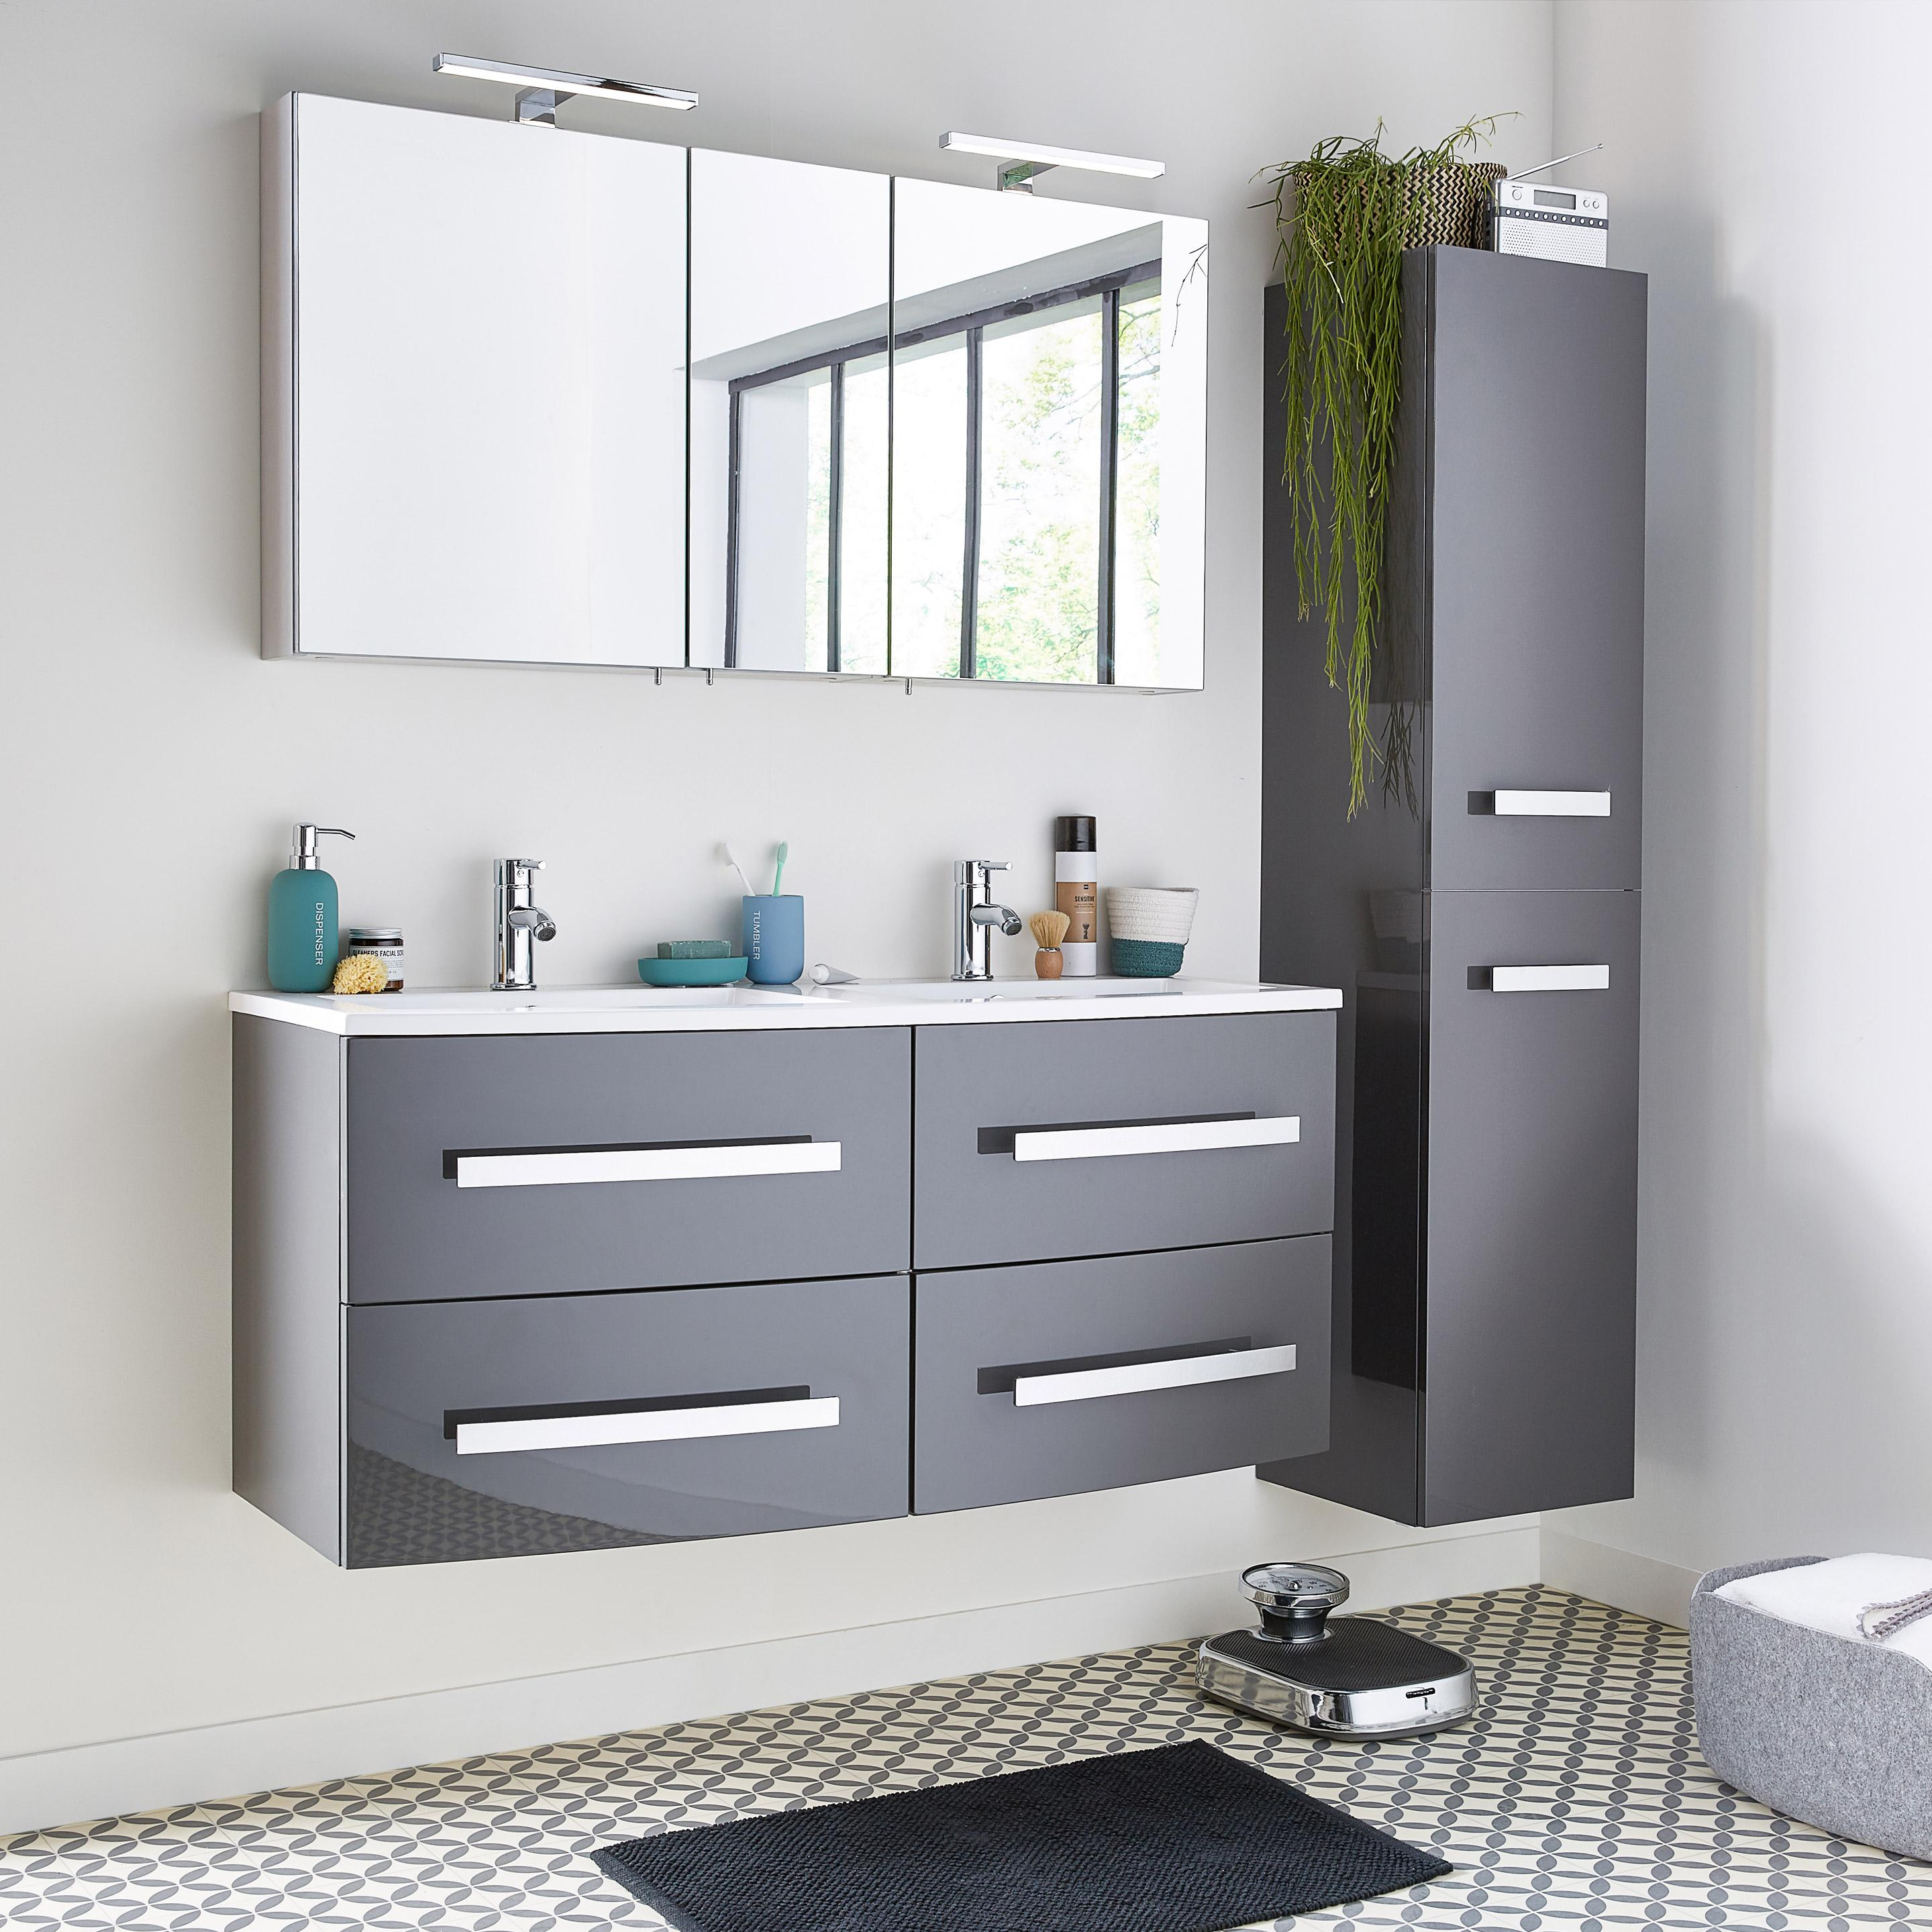 Meuble simple vasque l.121 x H.53.7 x P.47 cm, gris, Perla